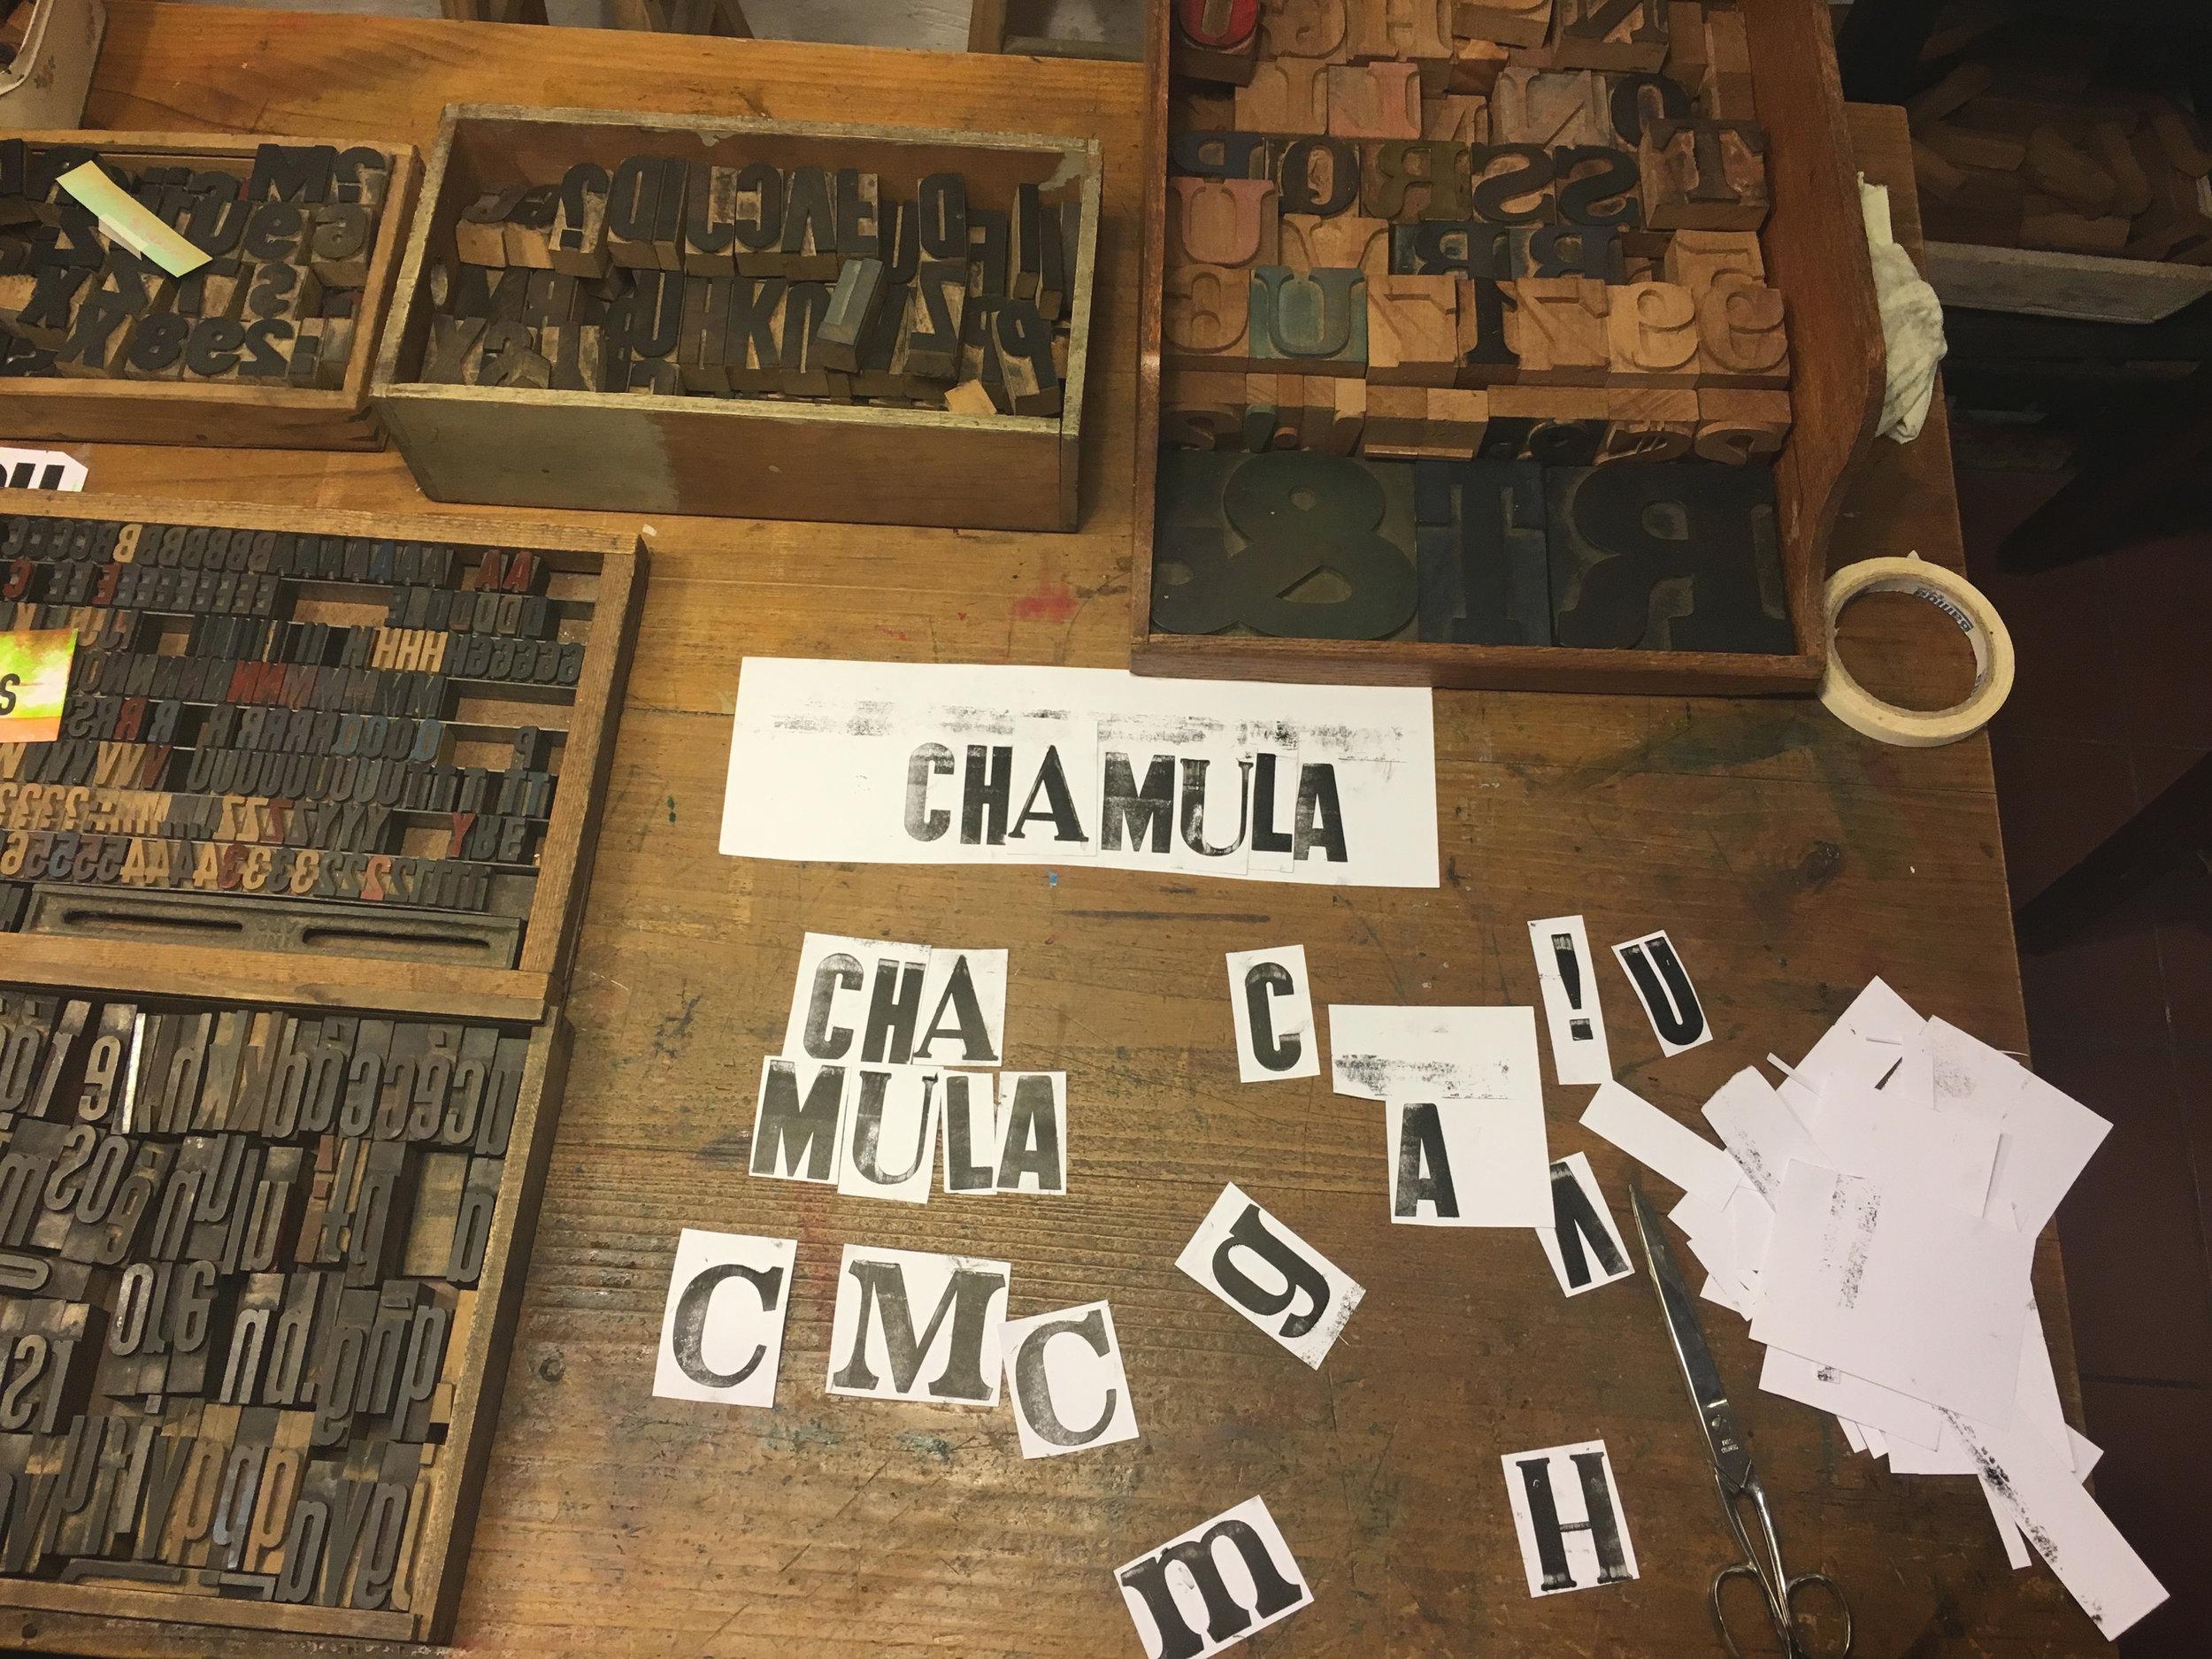 7-personalpress-taller-papel-principal-letterpress-imprenta-tipografica-1.jpg